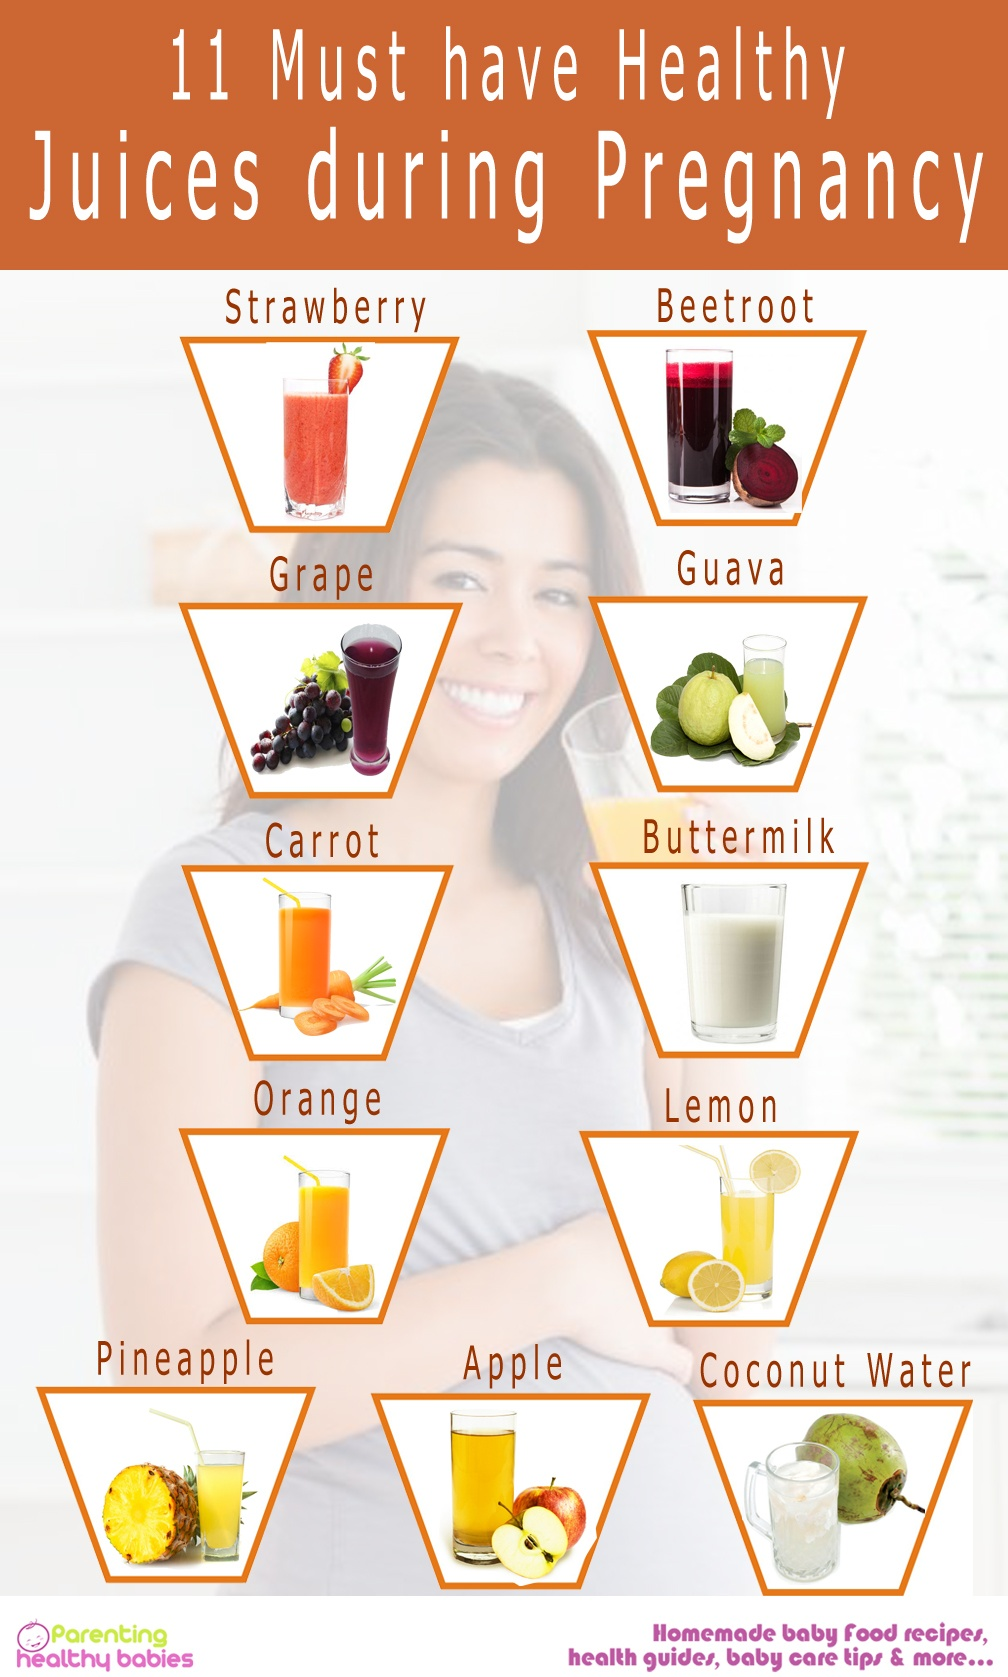 When Can Babies Have Juice : babies, juice, Healthy, Juices, During, Pregnancy